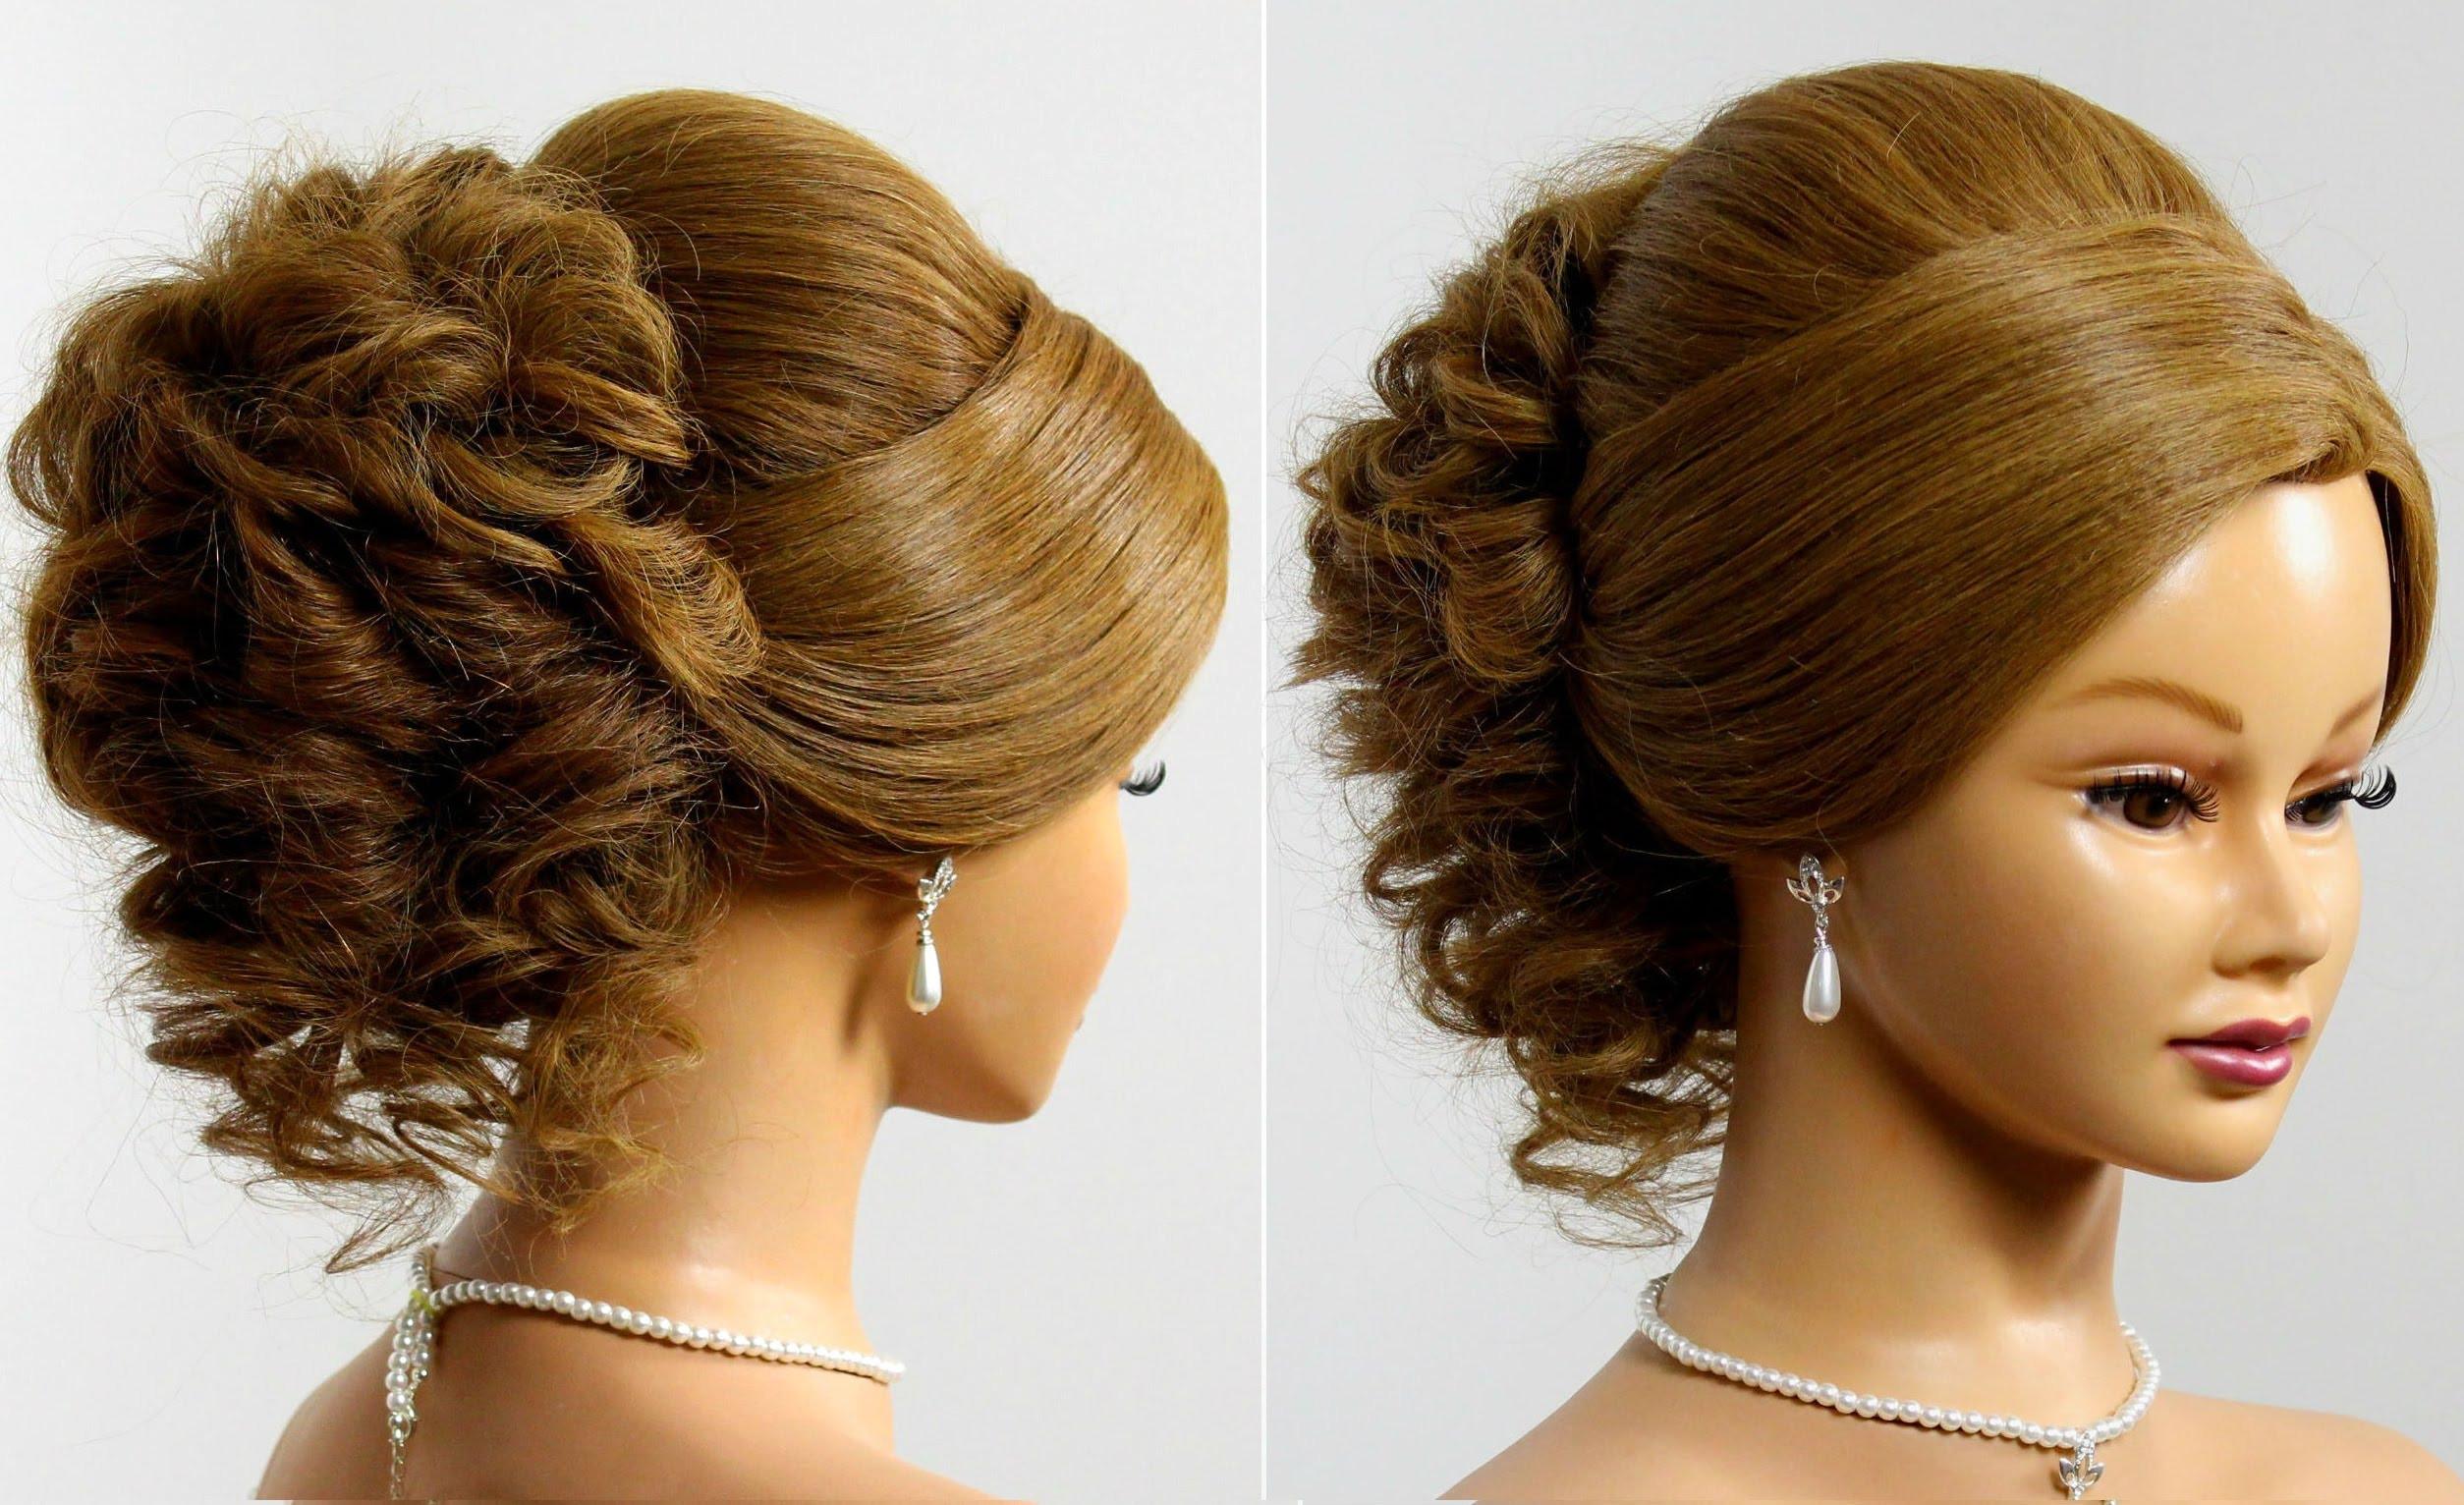 Homecoming Hairstyles For Medium Hair  Hairstyles for medium hair for prom Hairstyle for women